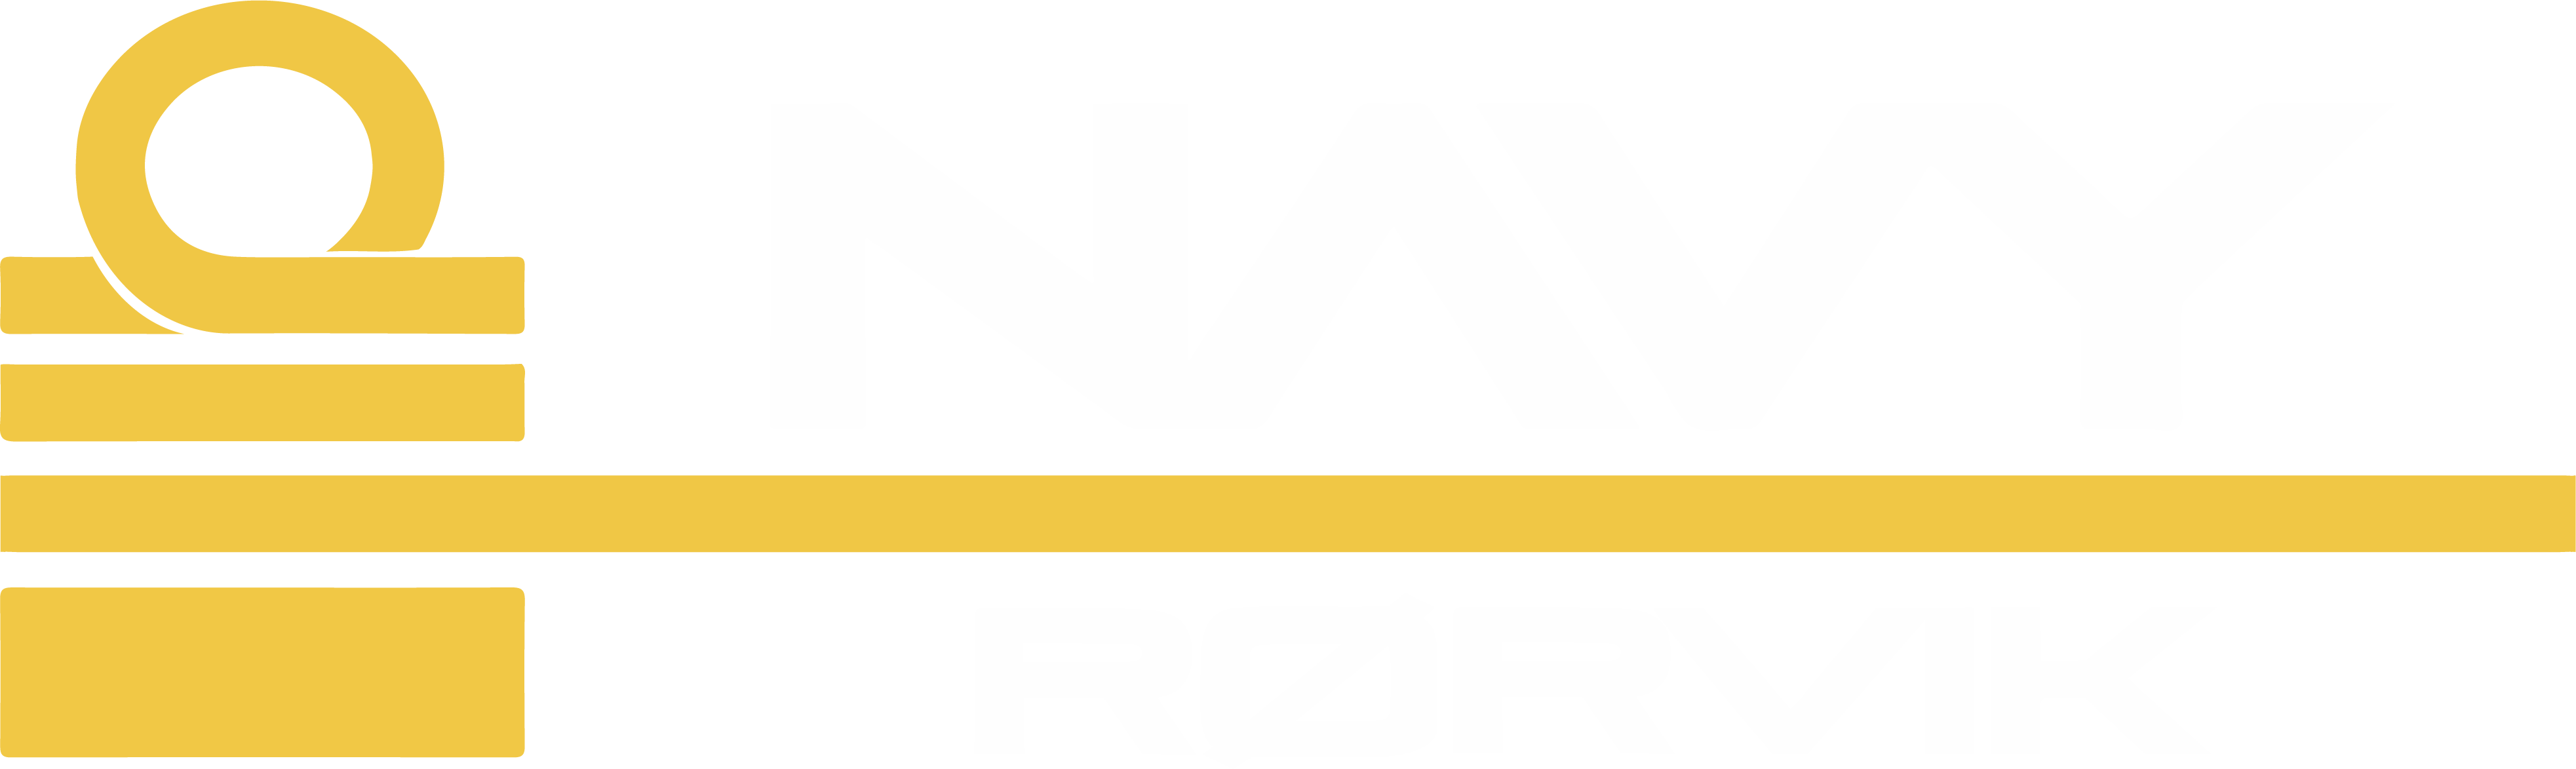 Navy Rørvik logo